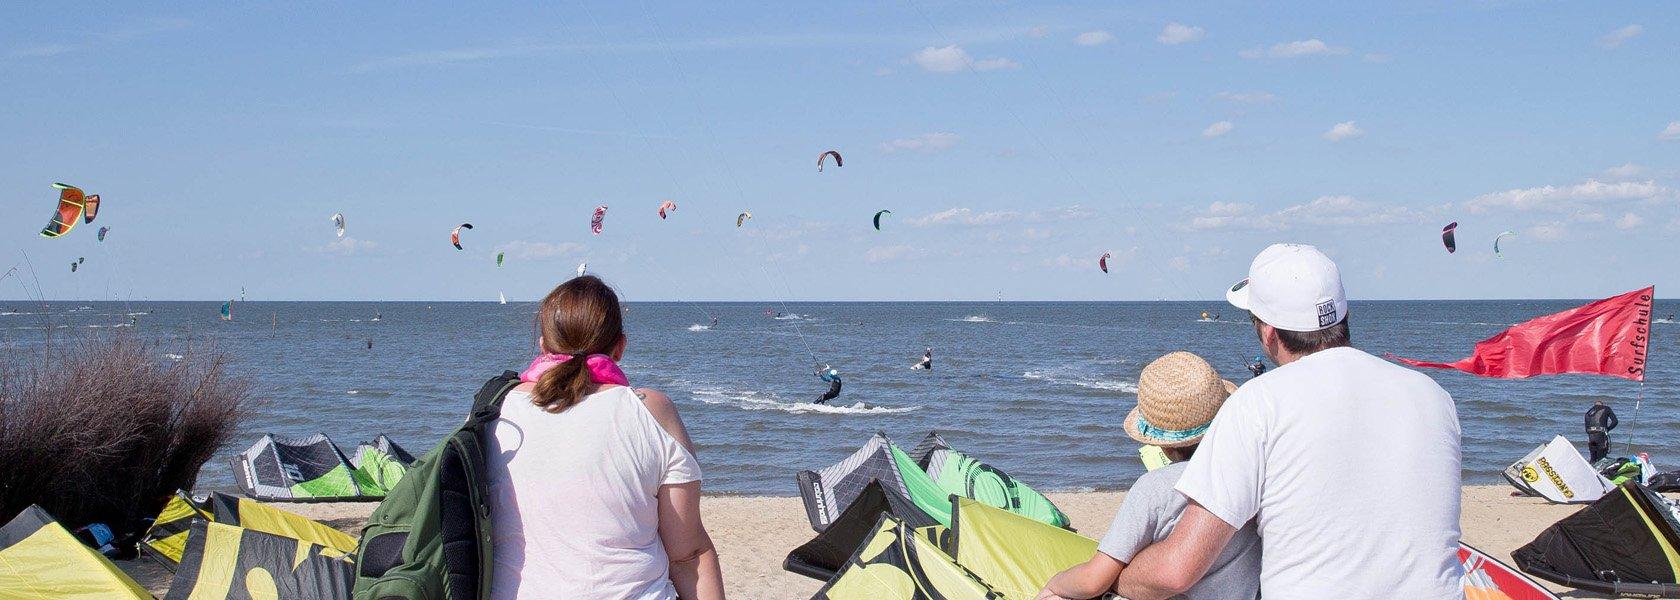 Kitesurfer in Cuxhaven, © Nordseeheilbad Cuxhaven GmbH